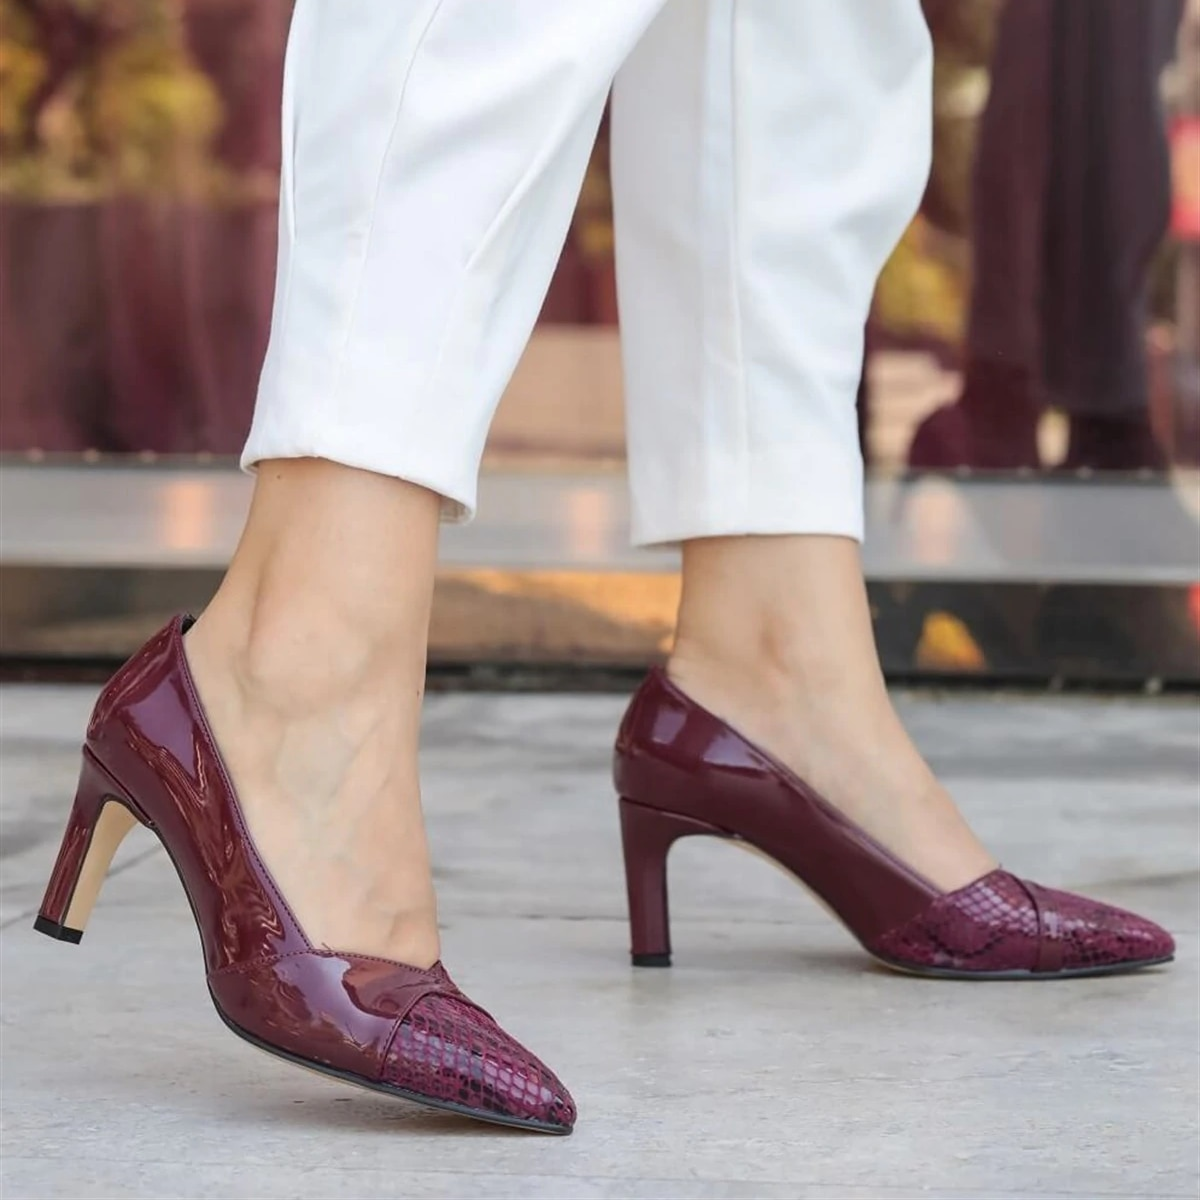 Mio Gusto-أحذية نسائية بكعب عالٍ خنجر ، أحذية عالية الجودة ، أحذية ماري جين ، لون أسود كحلي ، بورجوندي ، عاري ، ألوان أسمر 6 سنتيمتر منصة الأحذية